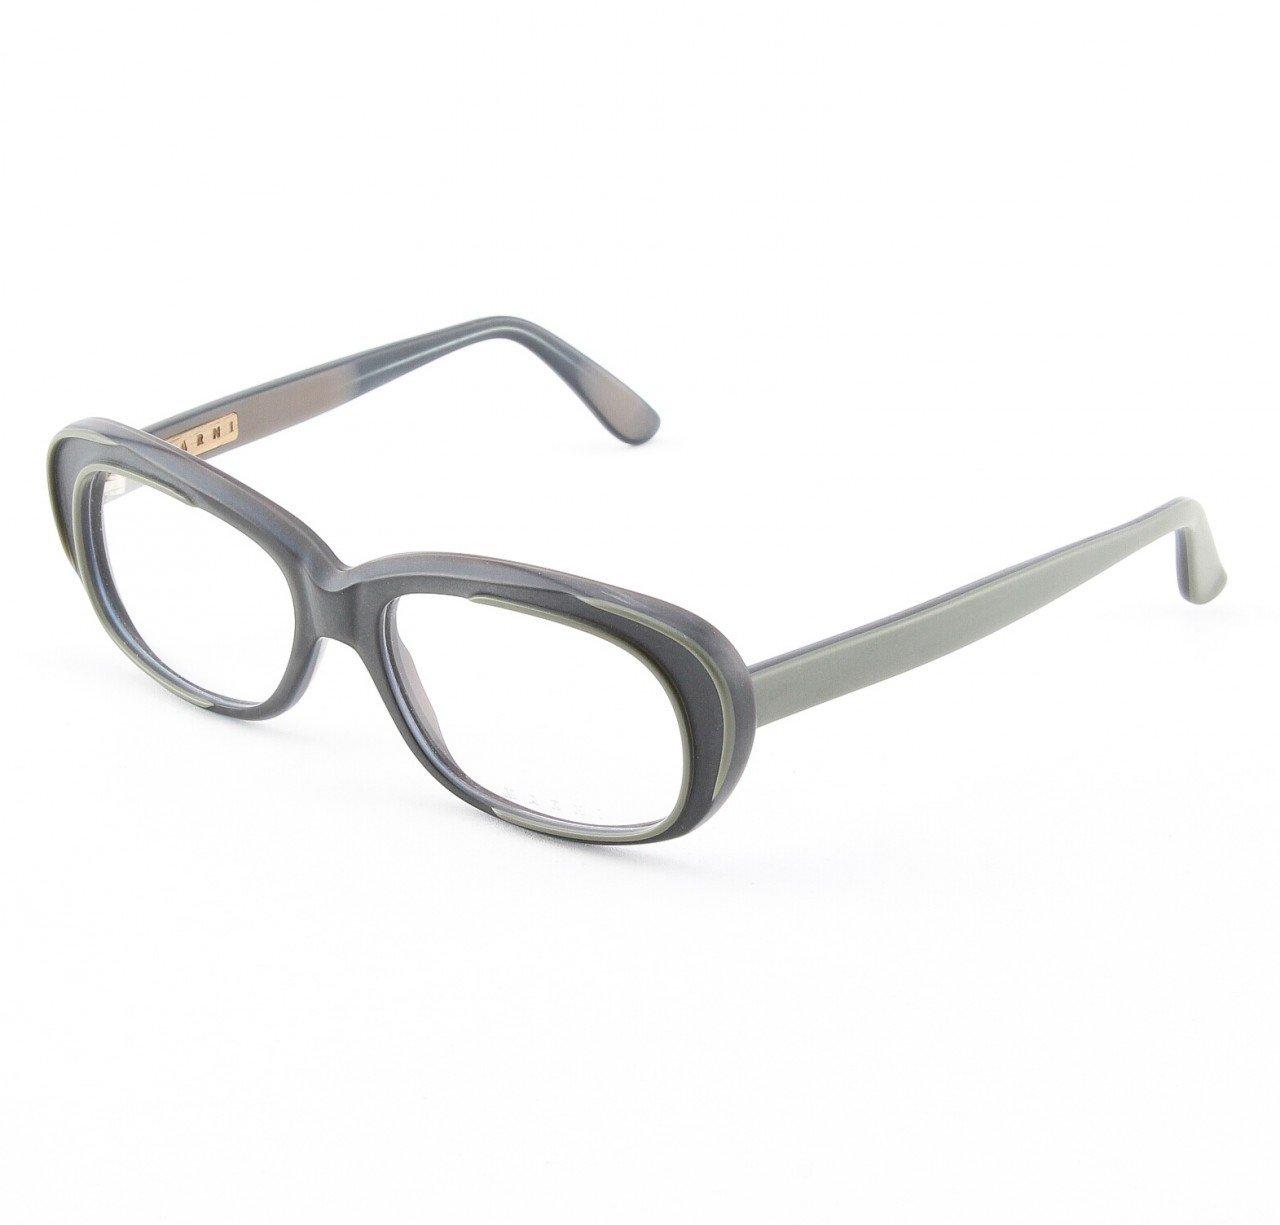 Marni MA670S Eyeglasses 01 Opaque Graphite Gray with Gray Trim, Demo Lens